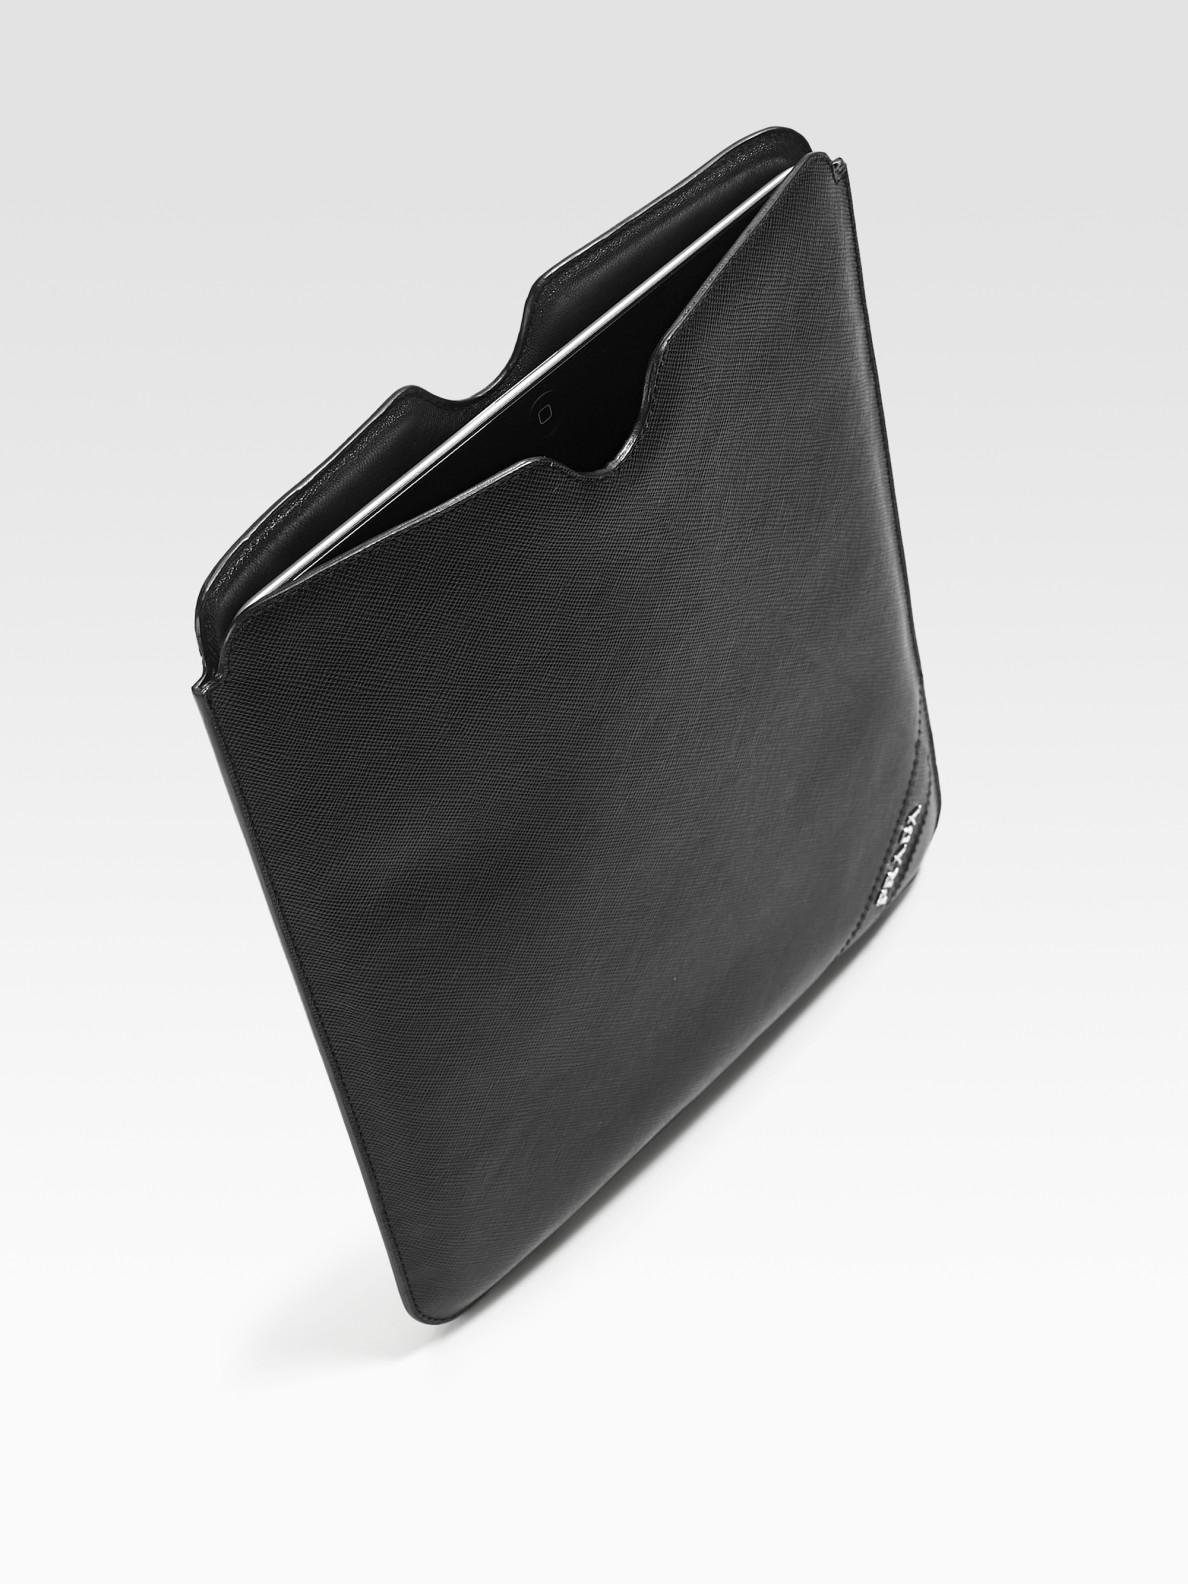 best website 492d9 4ea7f Prada Black Leather Case For Ipad for men